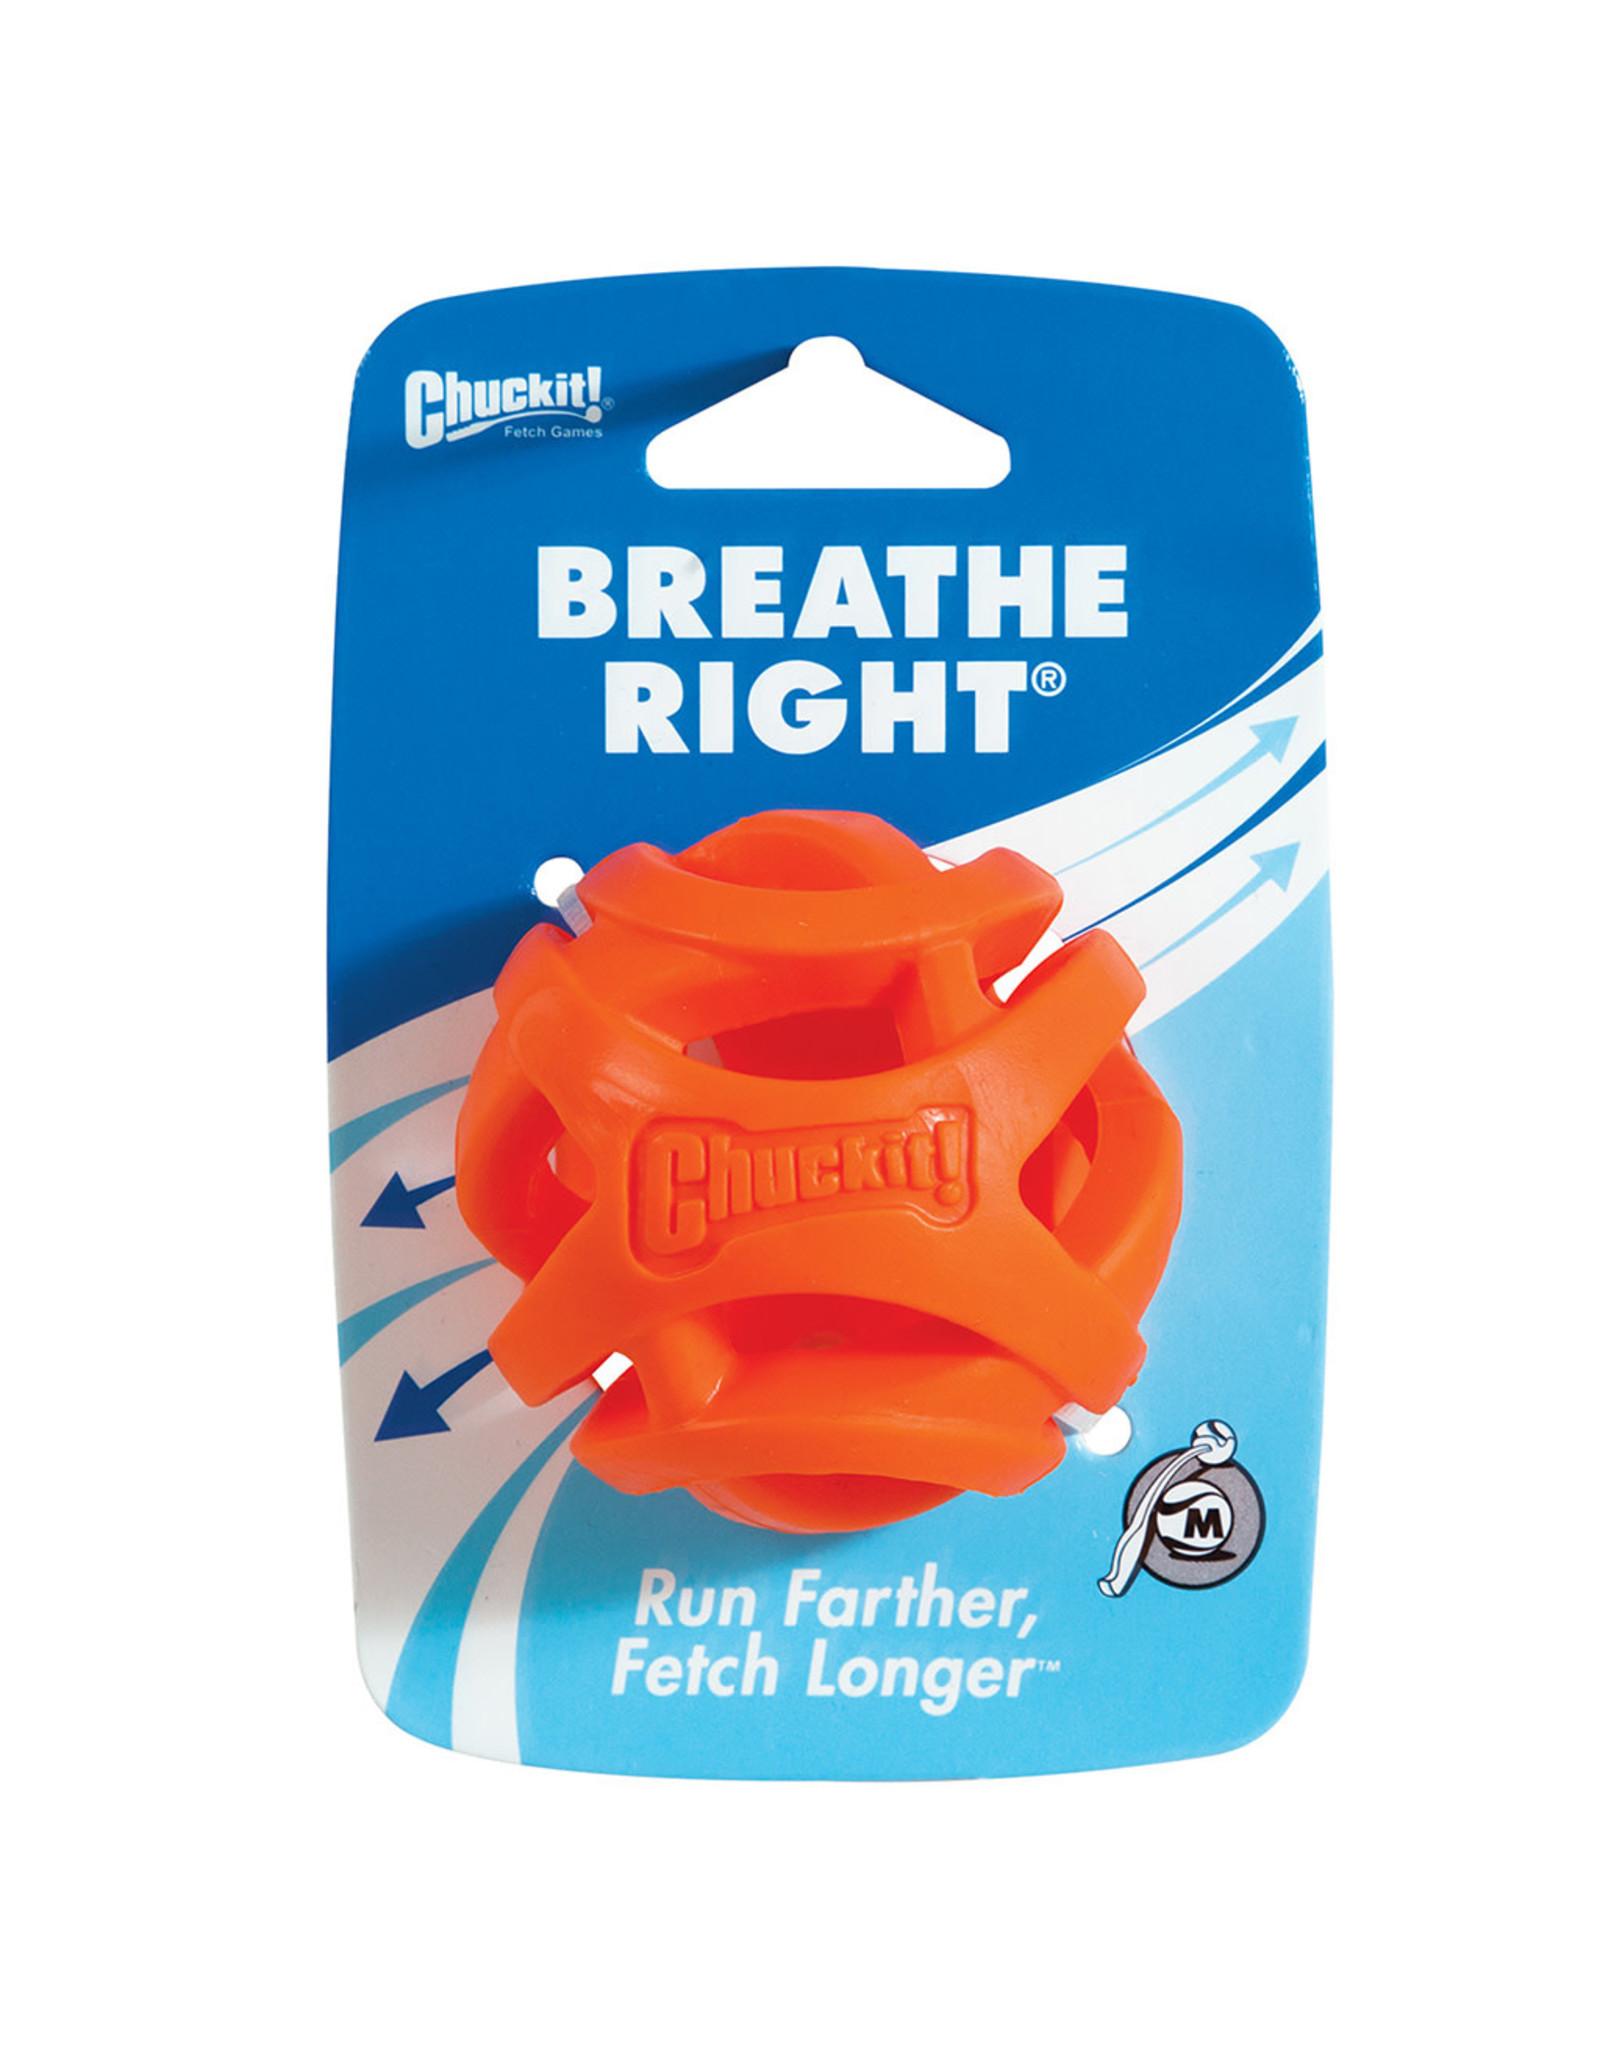 Chuckit! Chuckit! Breathe Right Fetch Ball